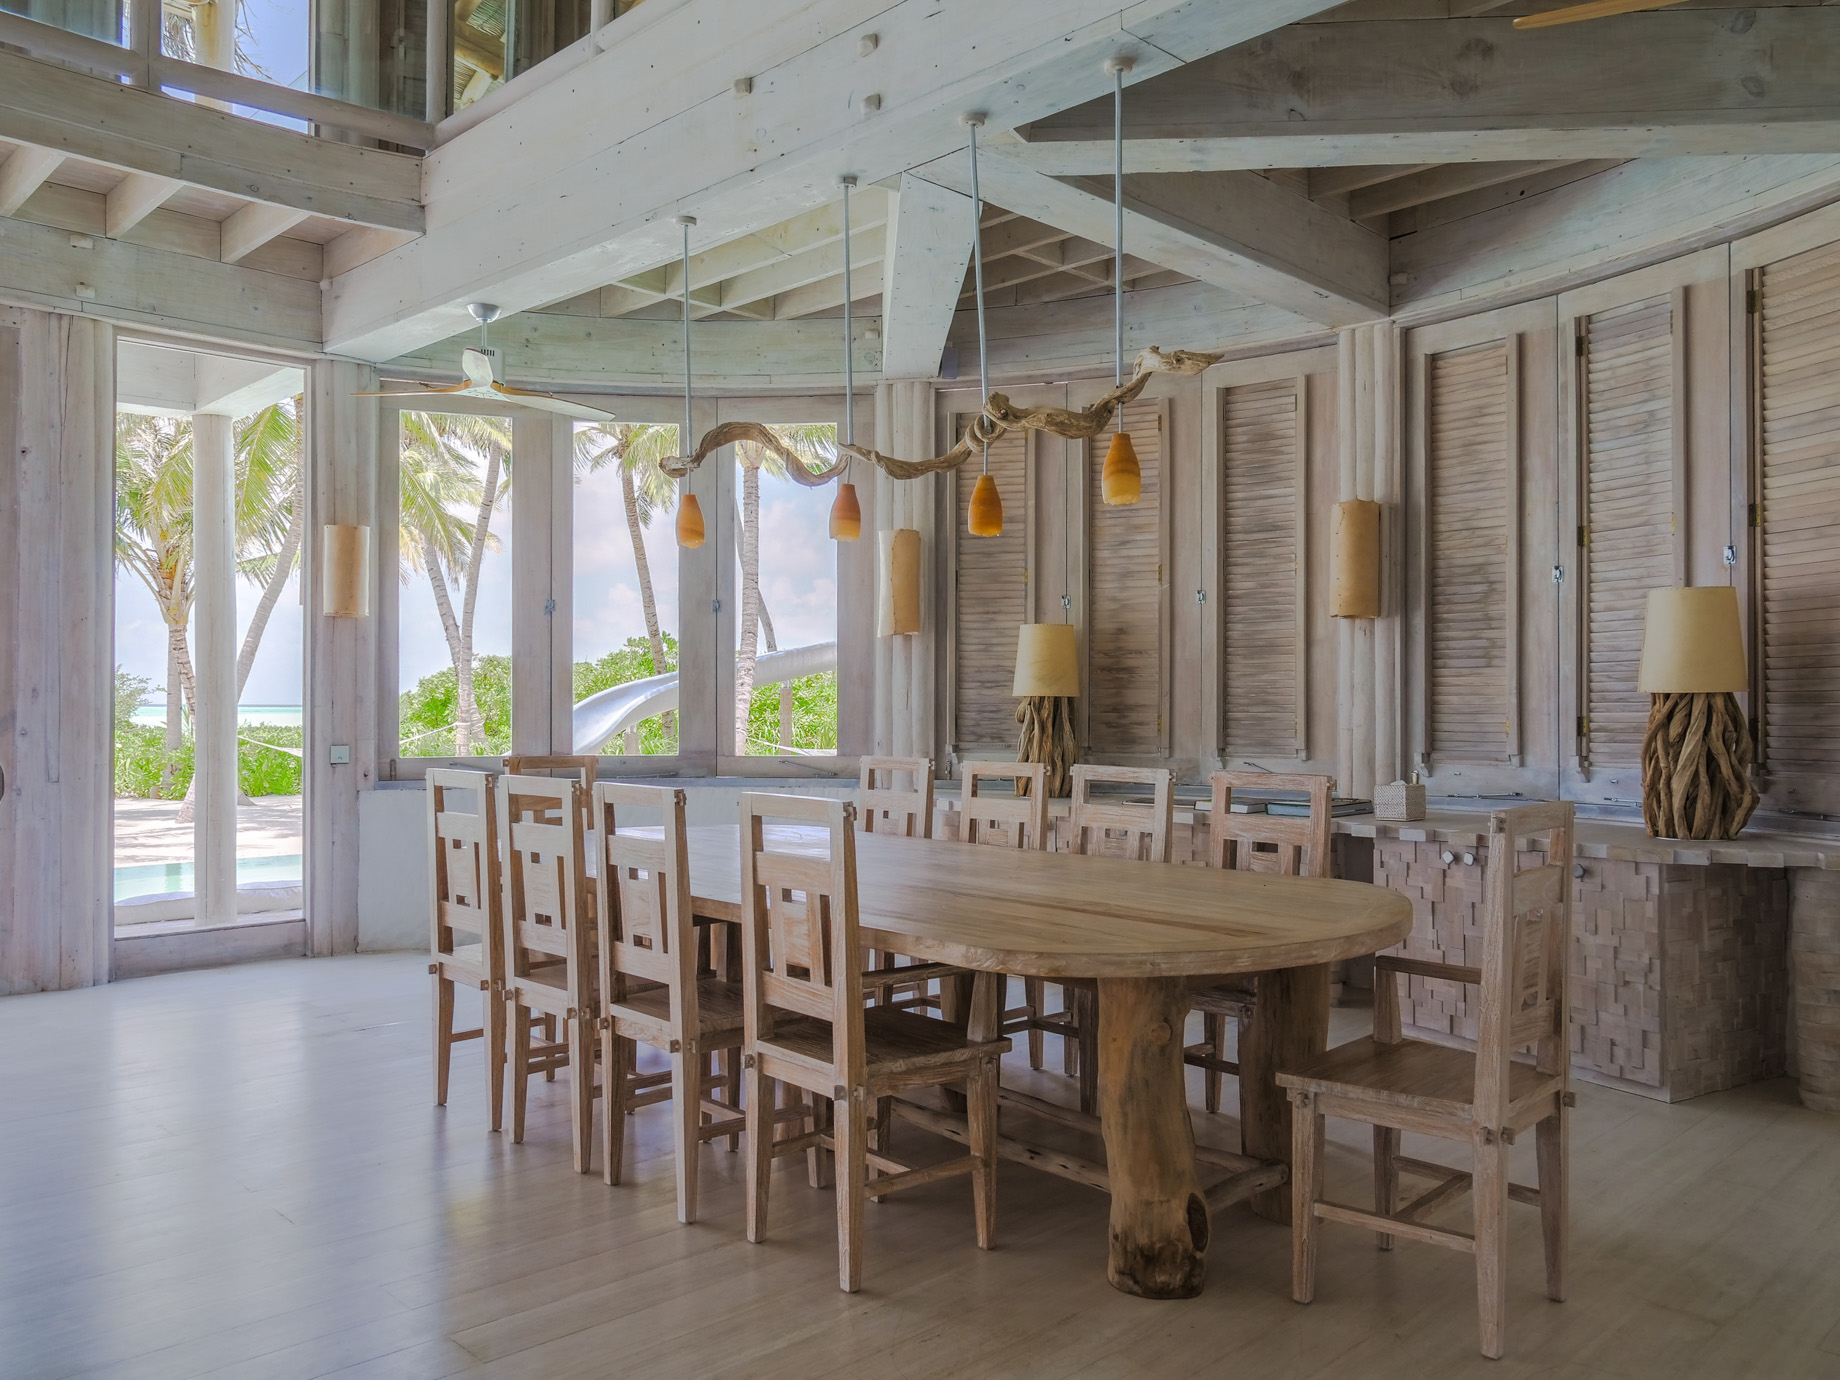 Soneva Jani Luxury Resort – Noonu Atoll, Medhufaru, Maldives – 4 Bedroom Island Reserve Villa Dining Table